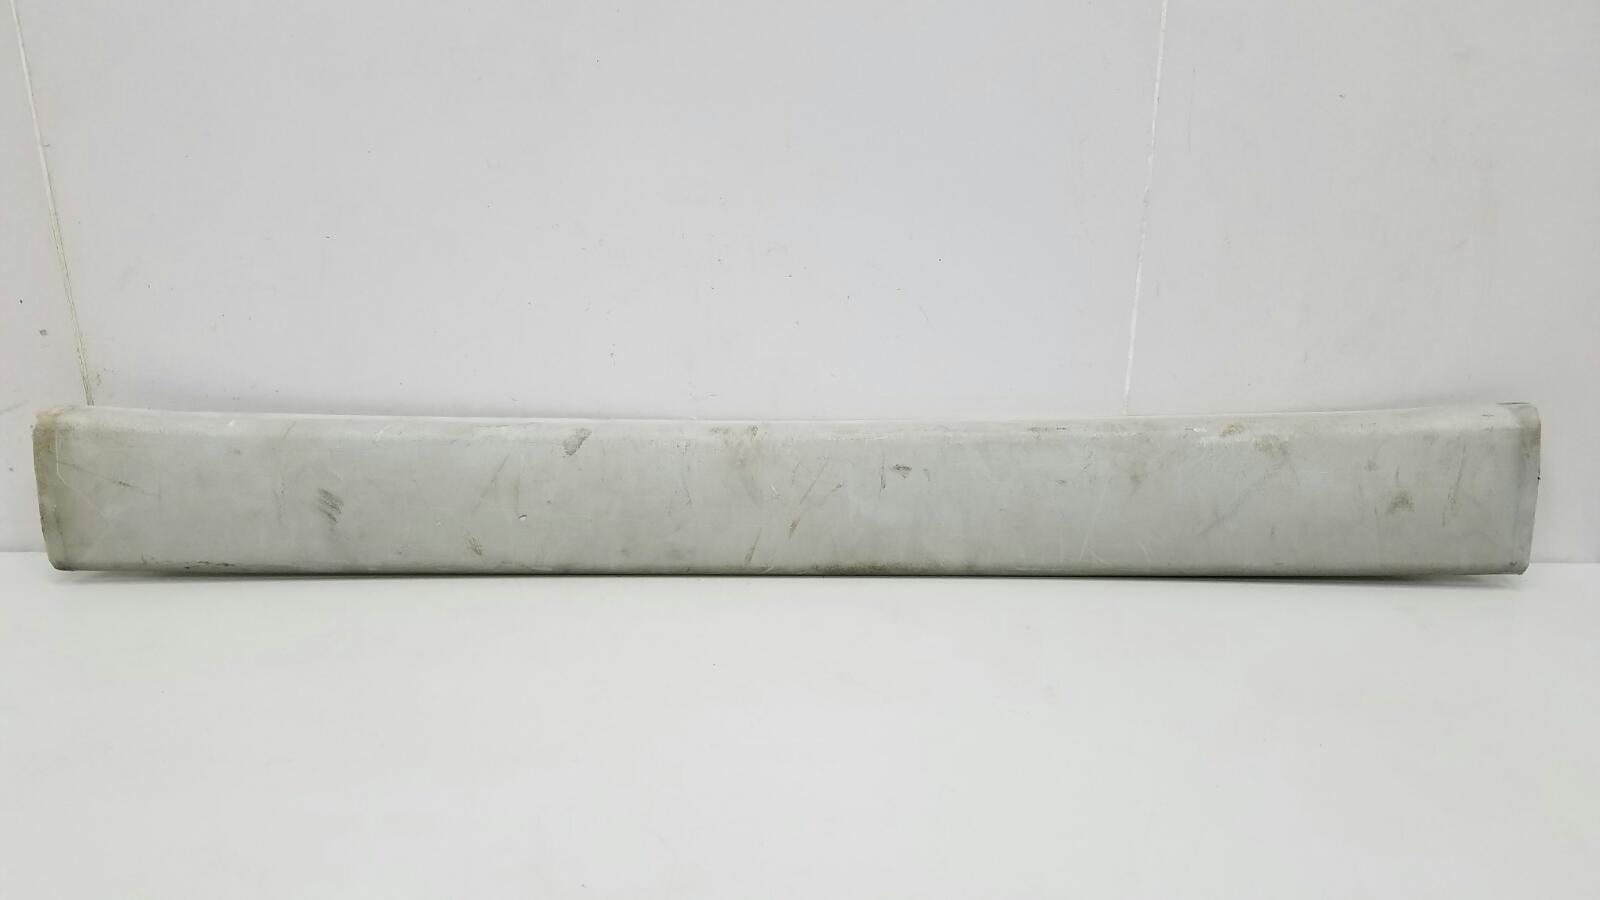 Обшивка потолка Volkswagen Pointer 3 5X1 BJR 1Л 2005